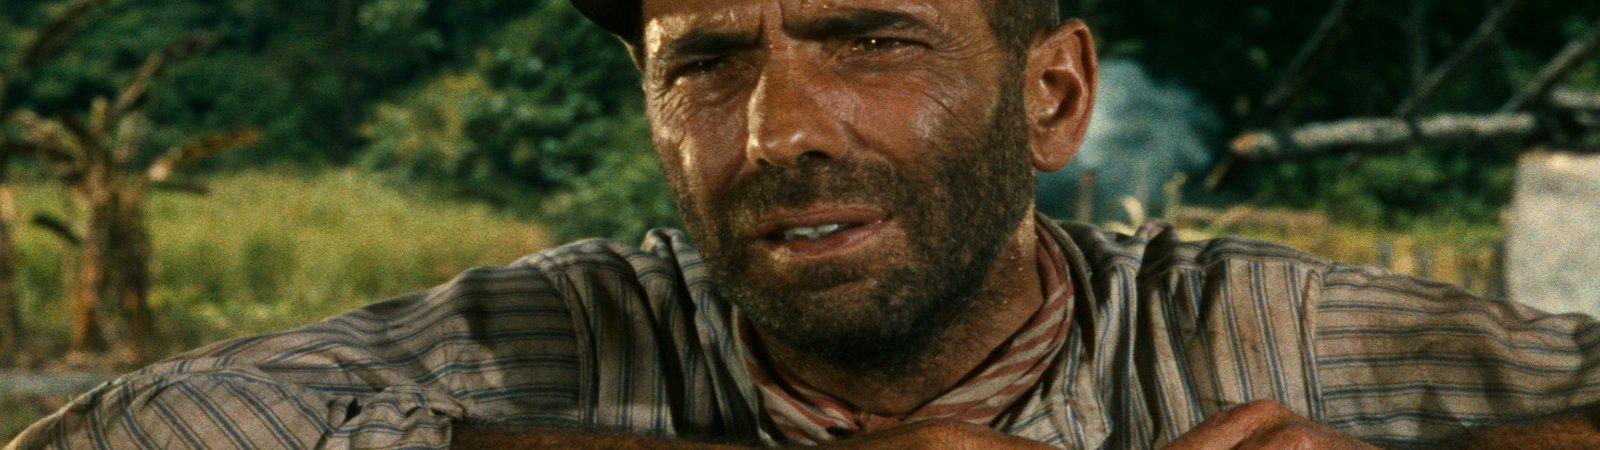 Photo dernier film Humphrey Bogart